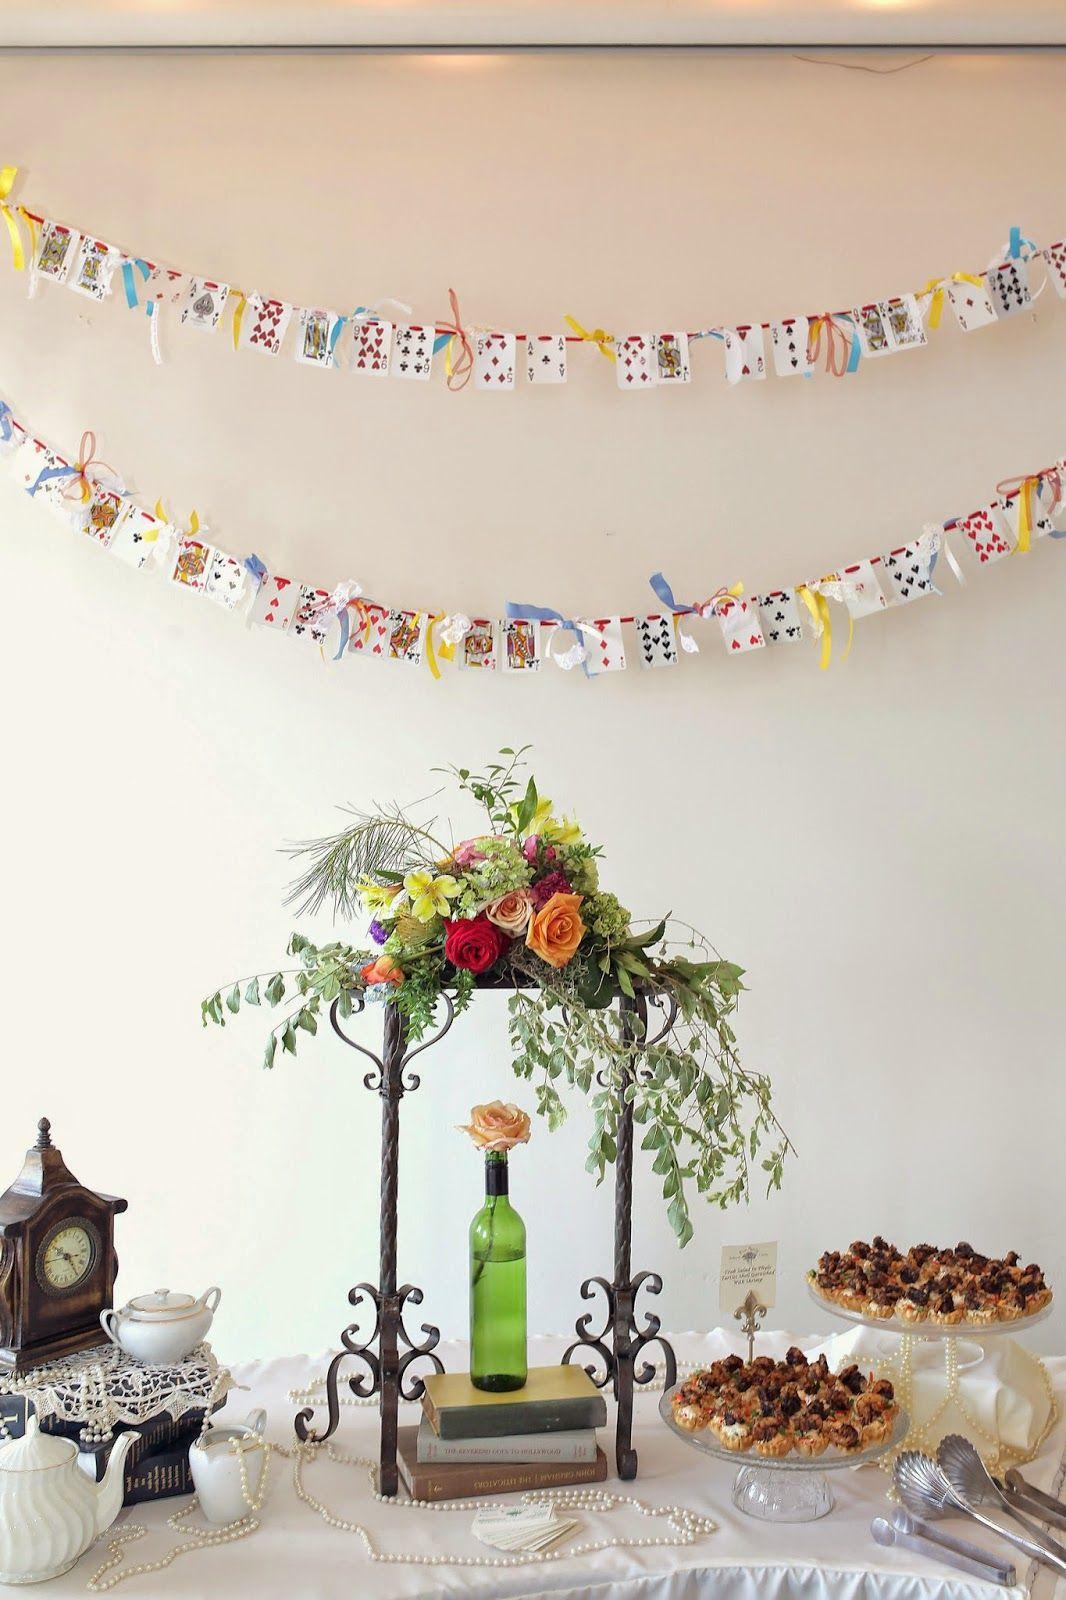 Alice in Wonderland Themed Wedding - Dessert Table - Wonderland ...